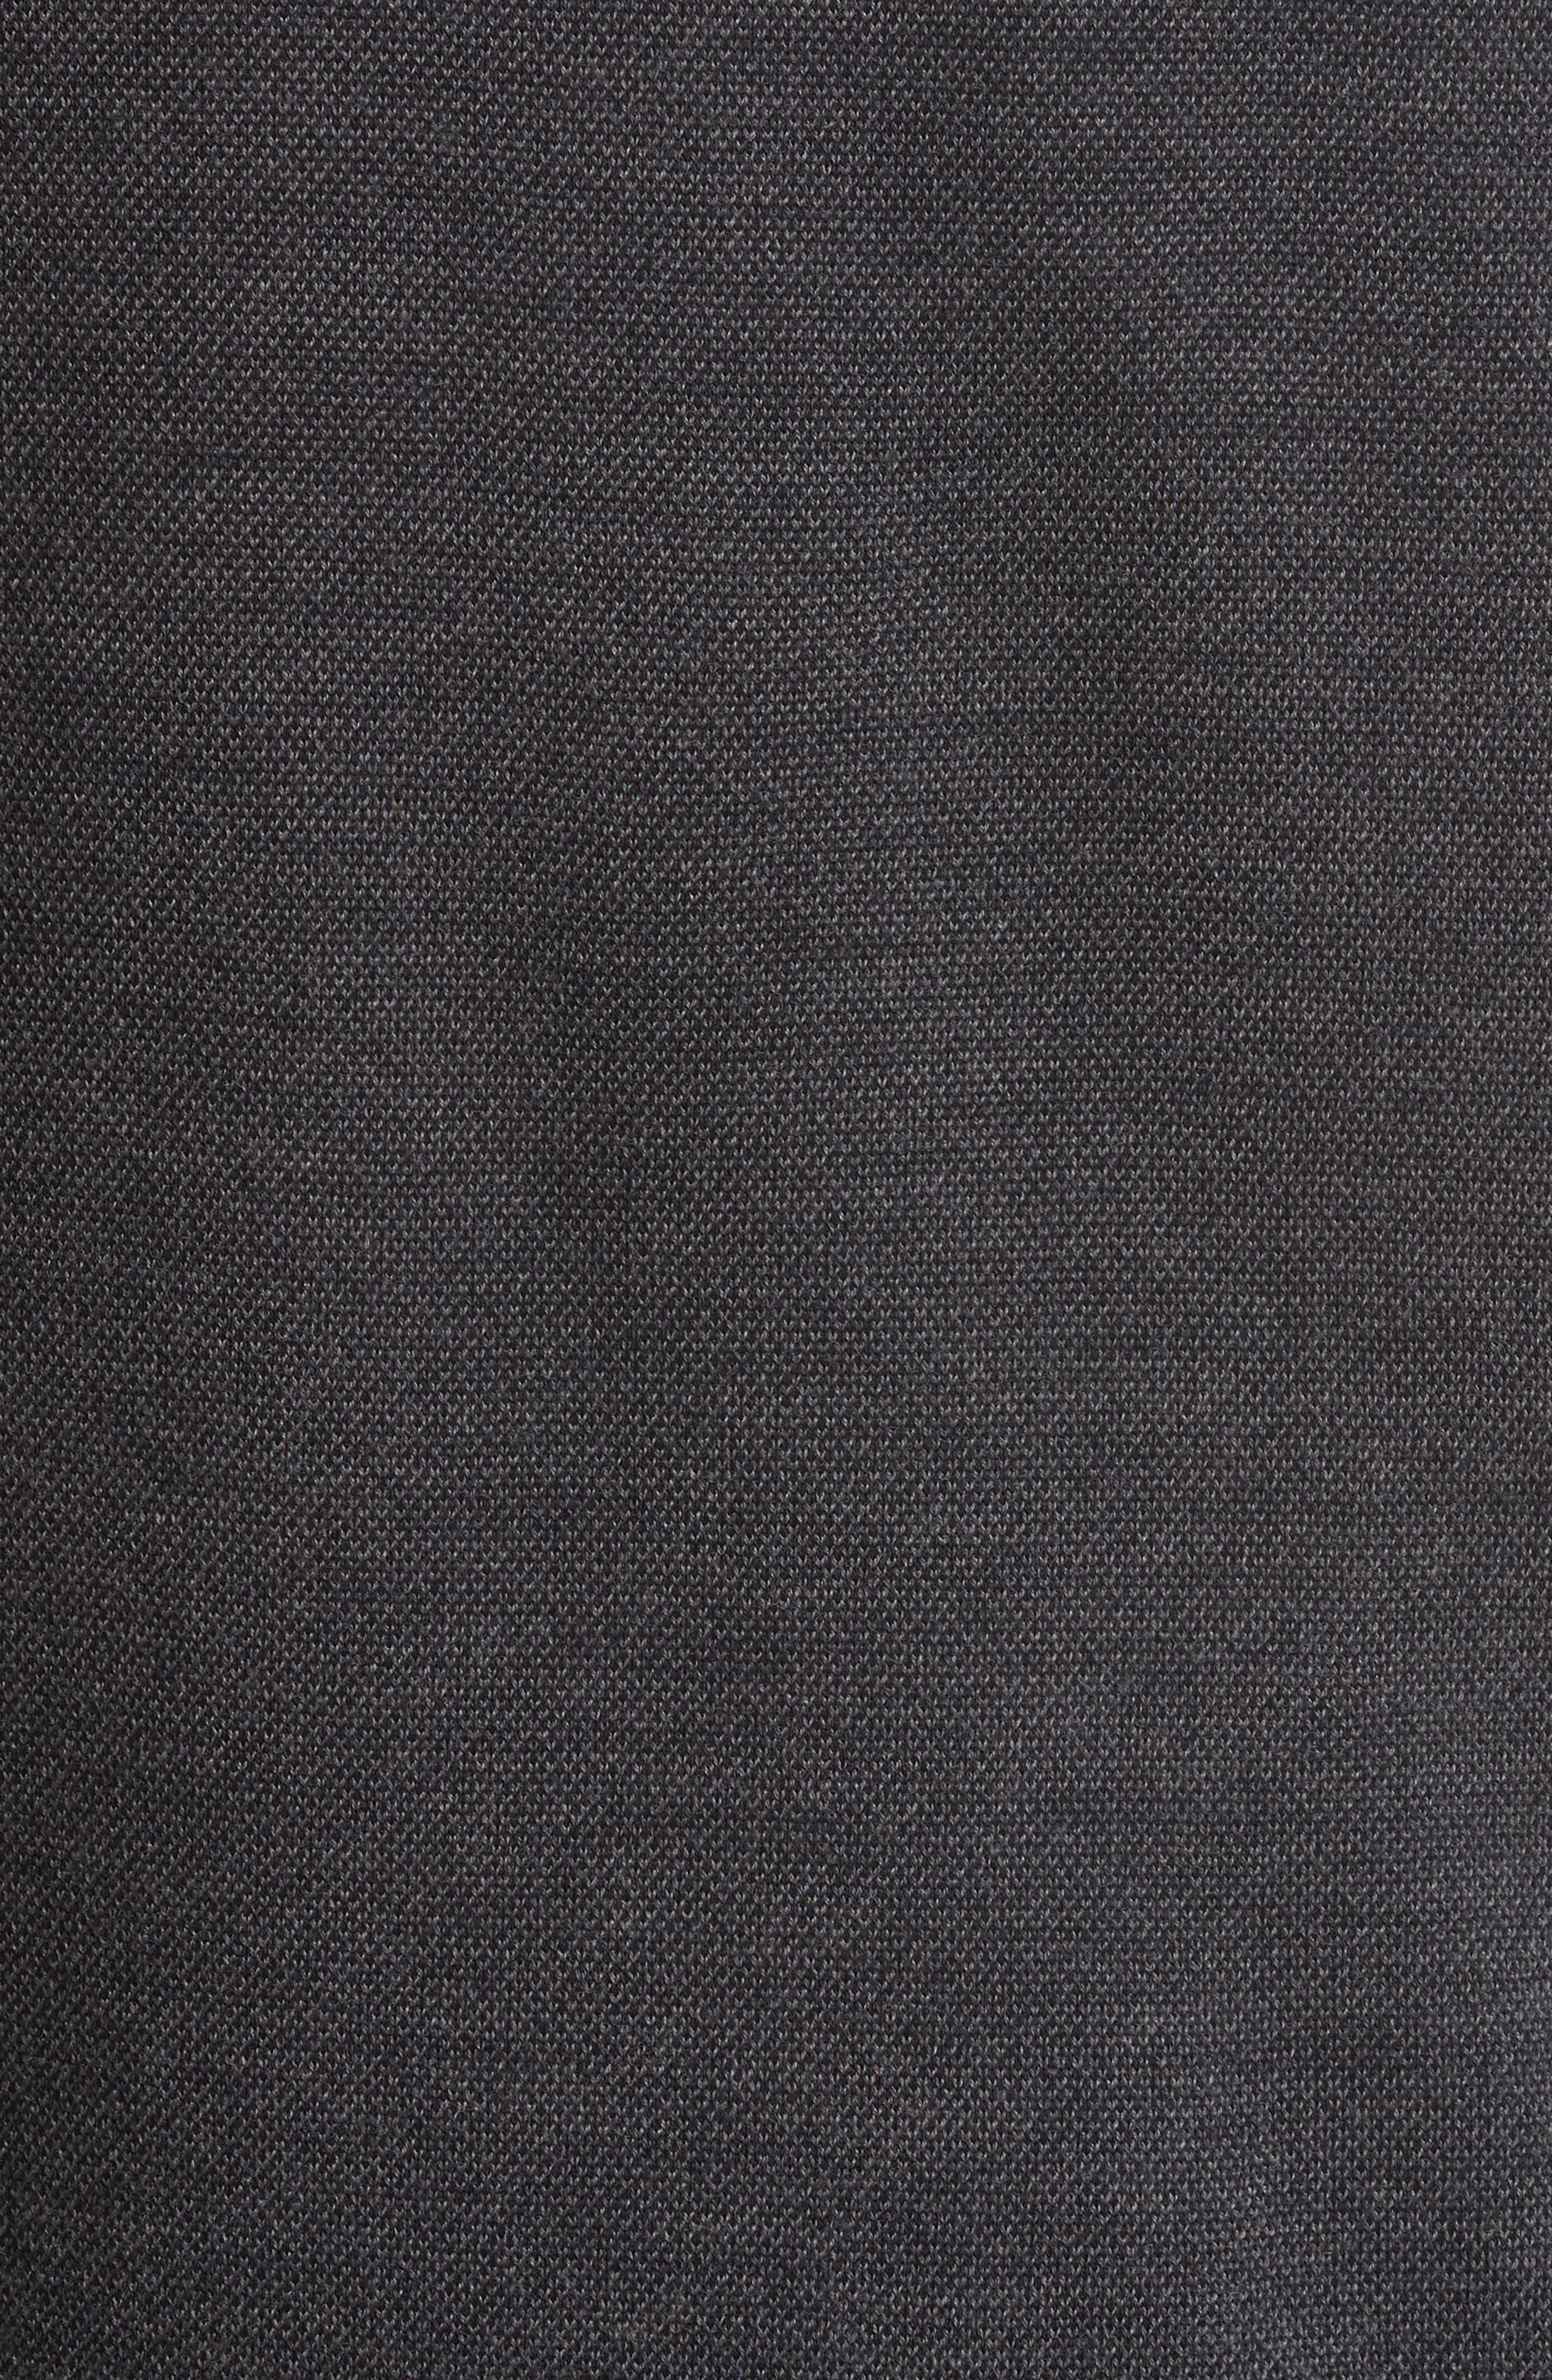 Regular Fit Wool Sweater,                             Alternate thumbnail 5, color,                             020